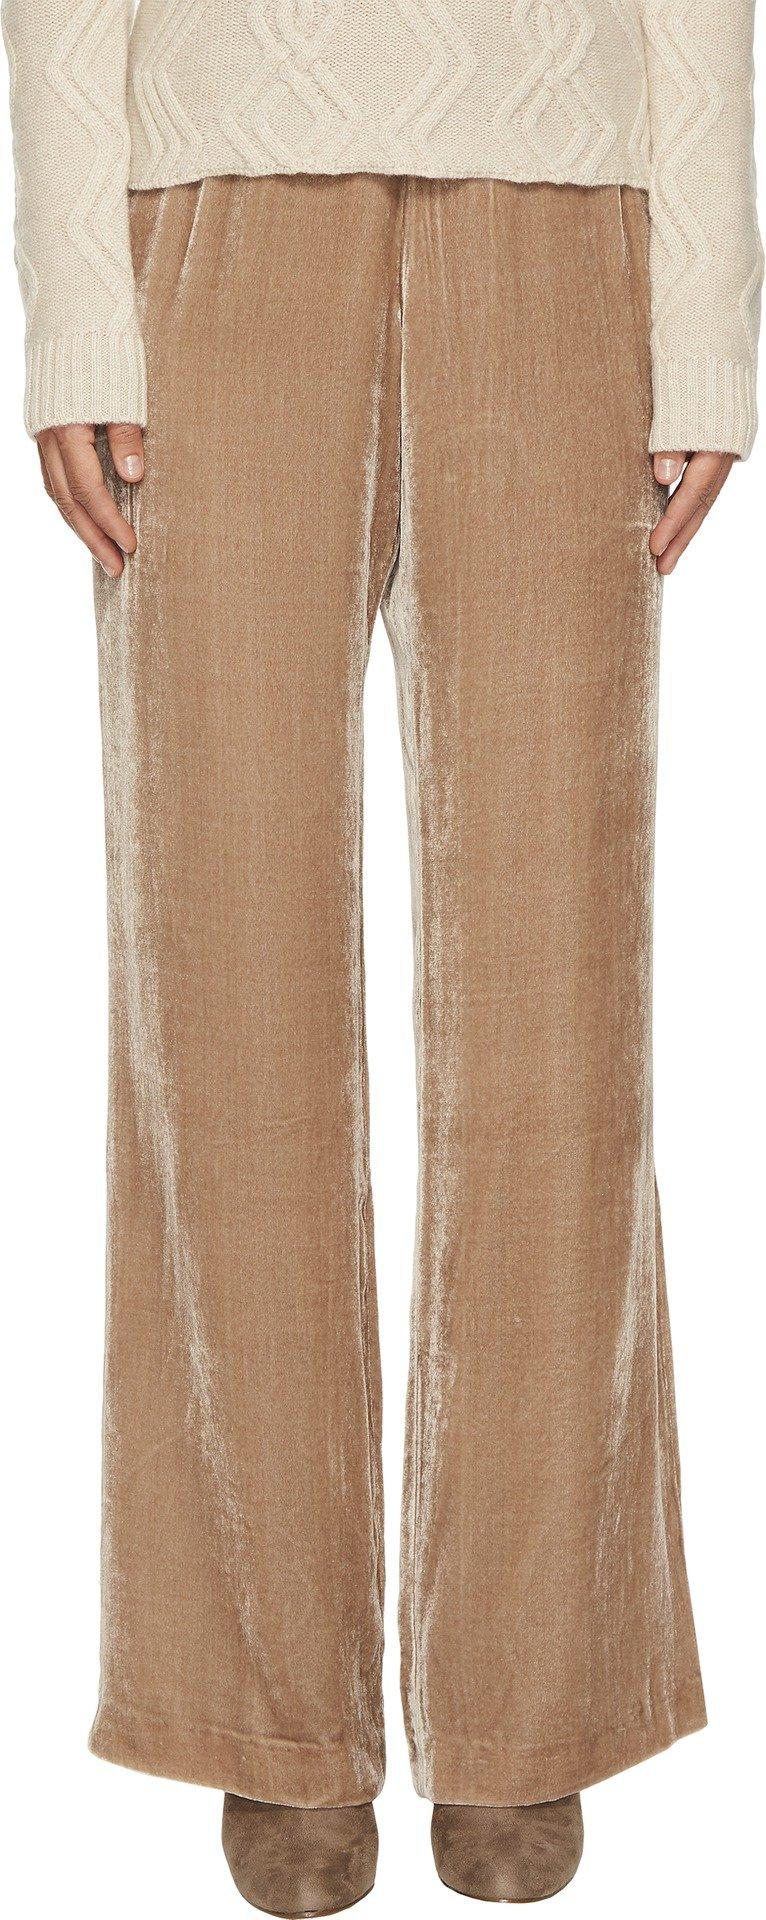 Cashmere In Love Women's Velvet Pants Nude Medium